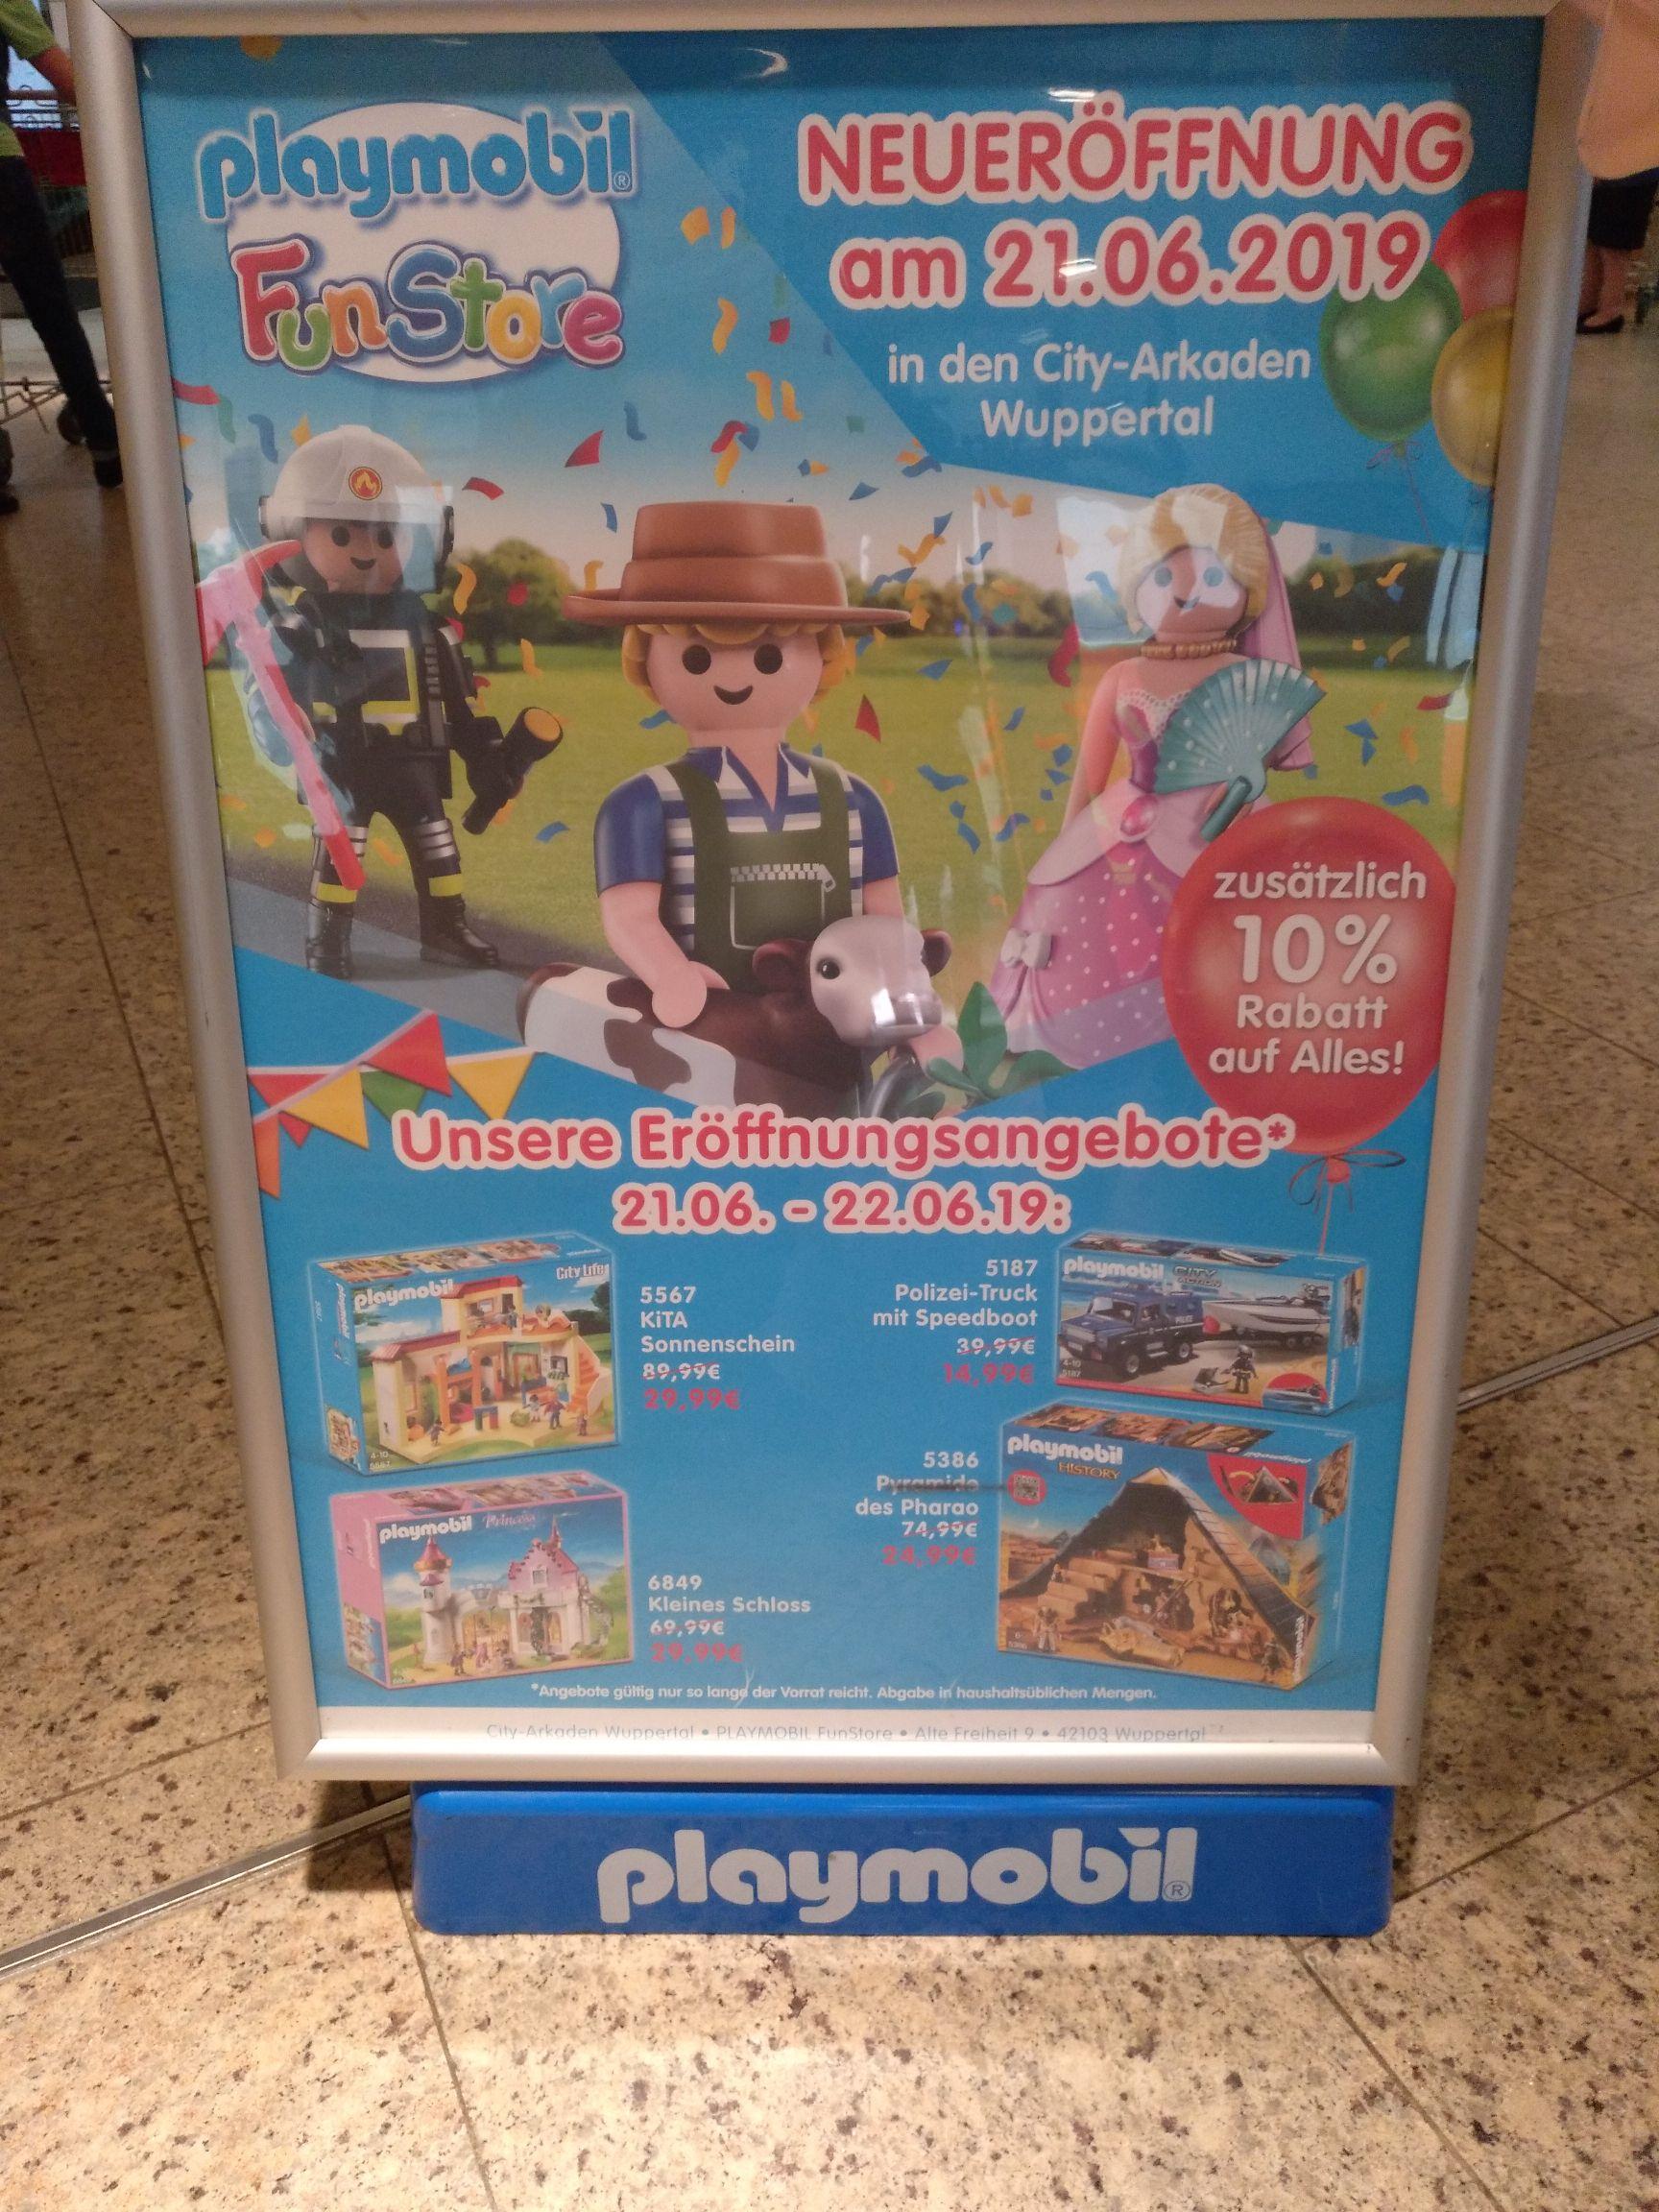 Playmobil Store Eröffnung Wuppertal City-Arkaden Angebote + 10% Rabatt